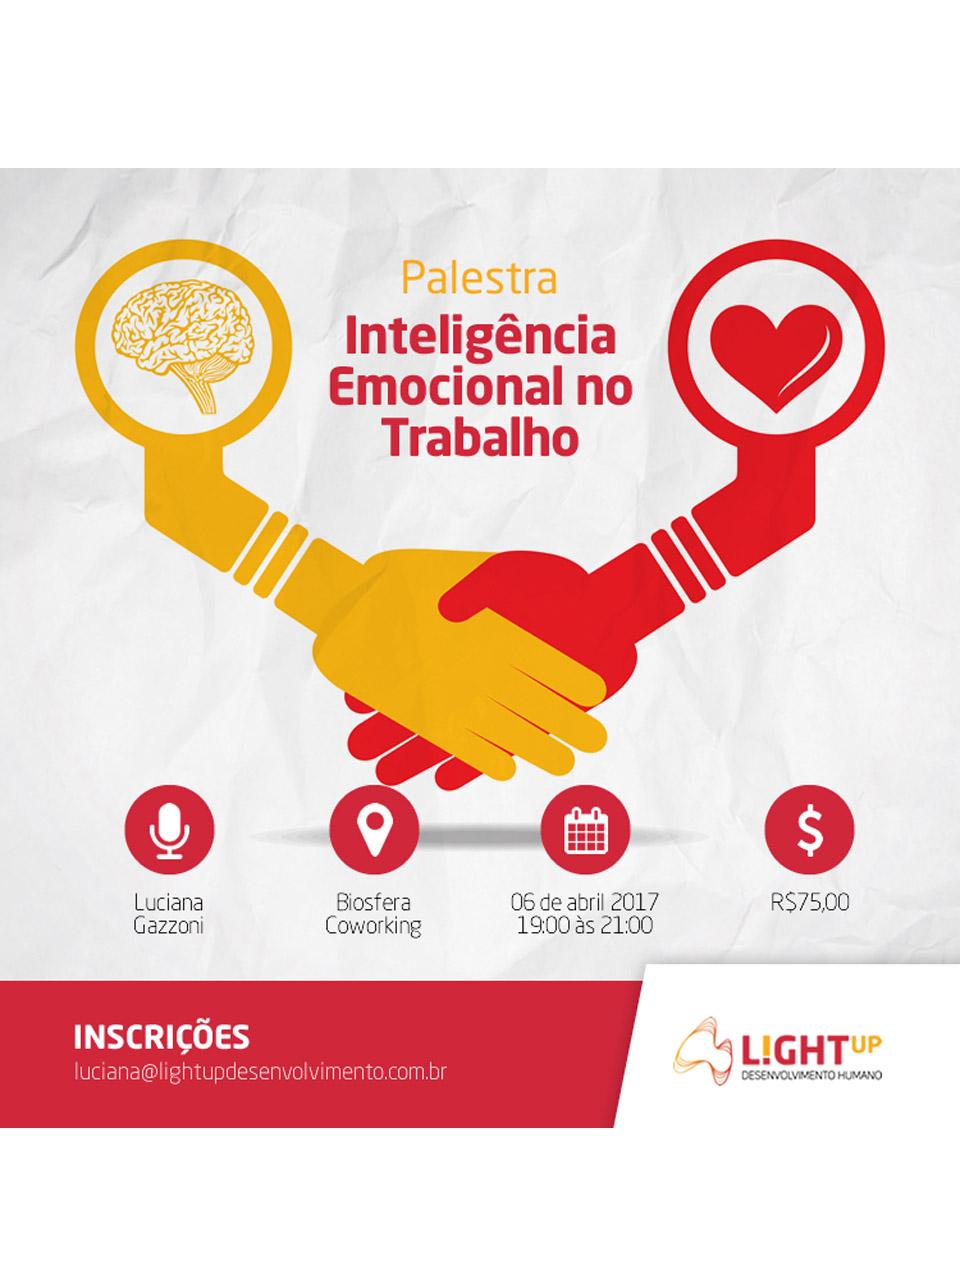 Palestra Biosfera Coworking Curitiba Inteligência Emocional no Trabalho